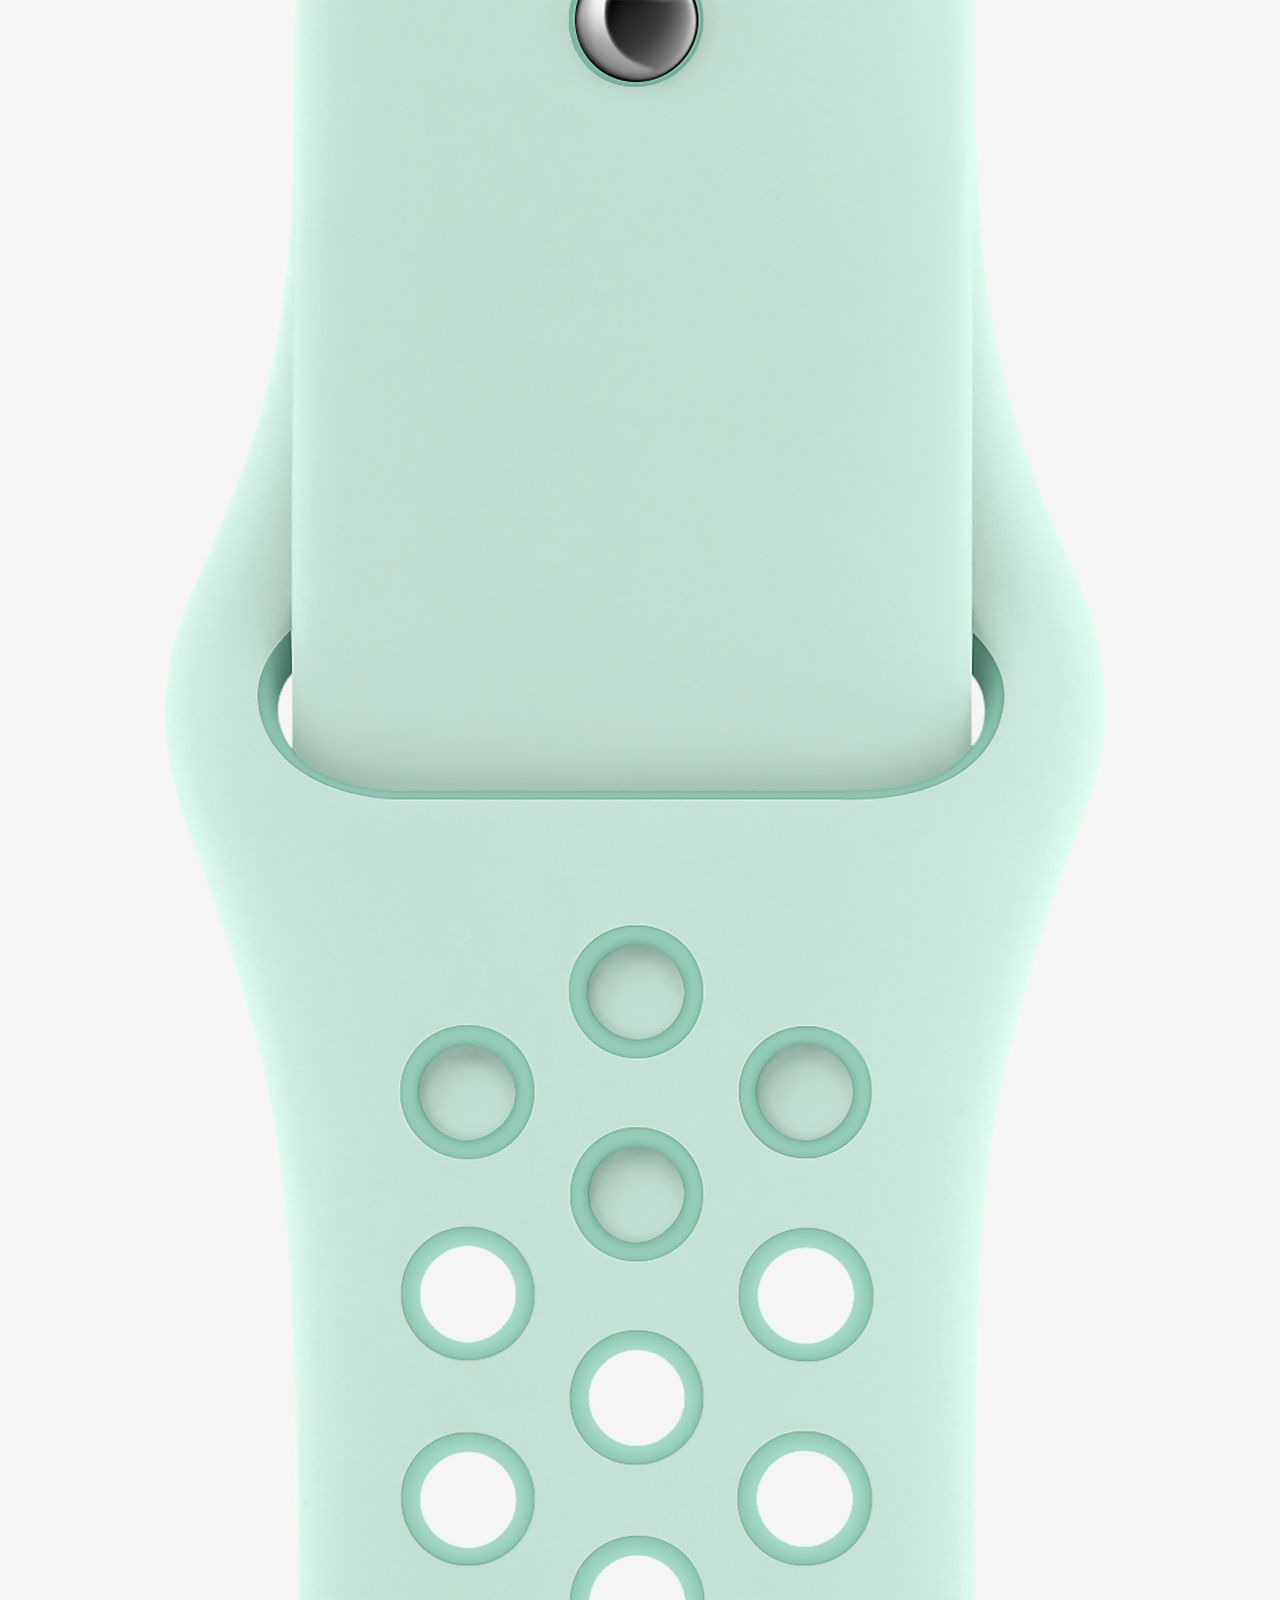 Sportbandje van Nike — Teal Tint/Tropical Twist (44 mm, S/M en M/L)